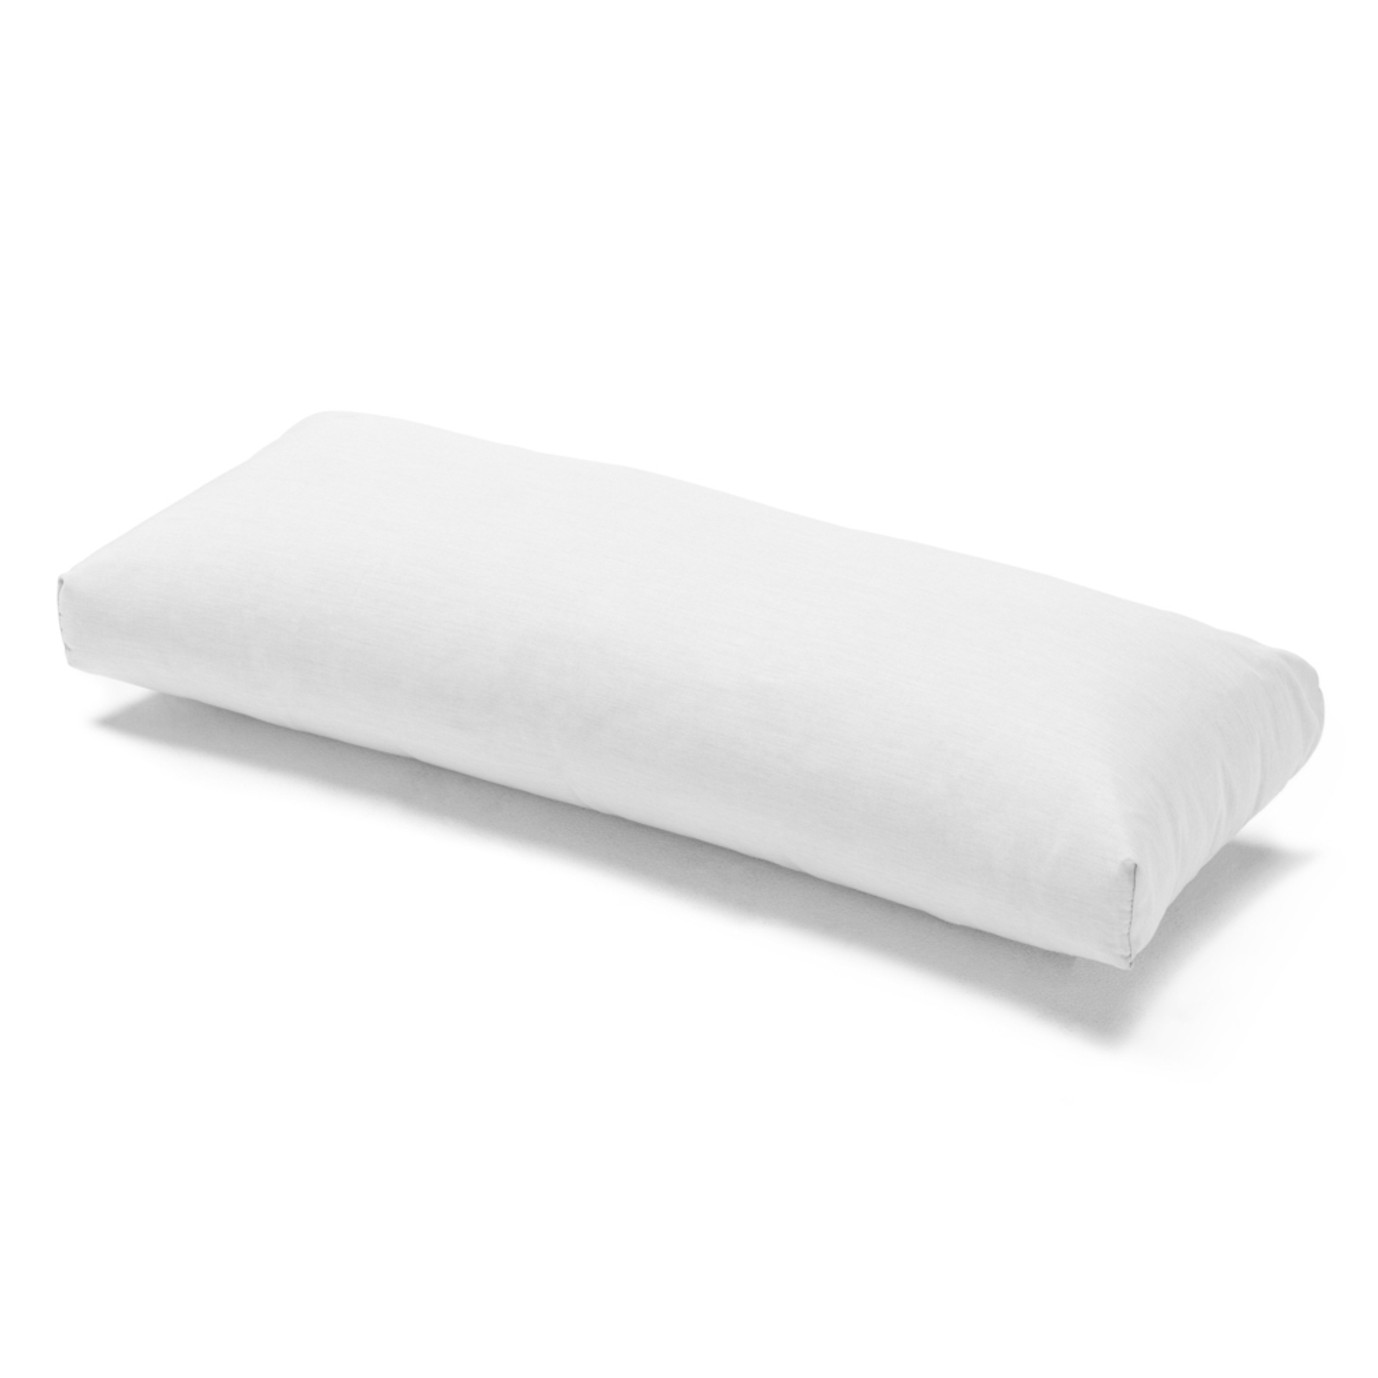 Portofino Sling 96in Sofa Back Cushion - Beige Fennel